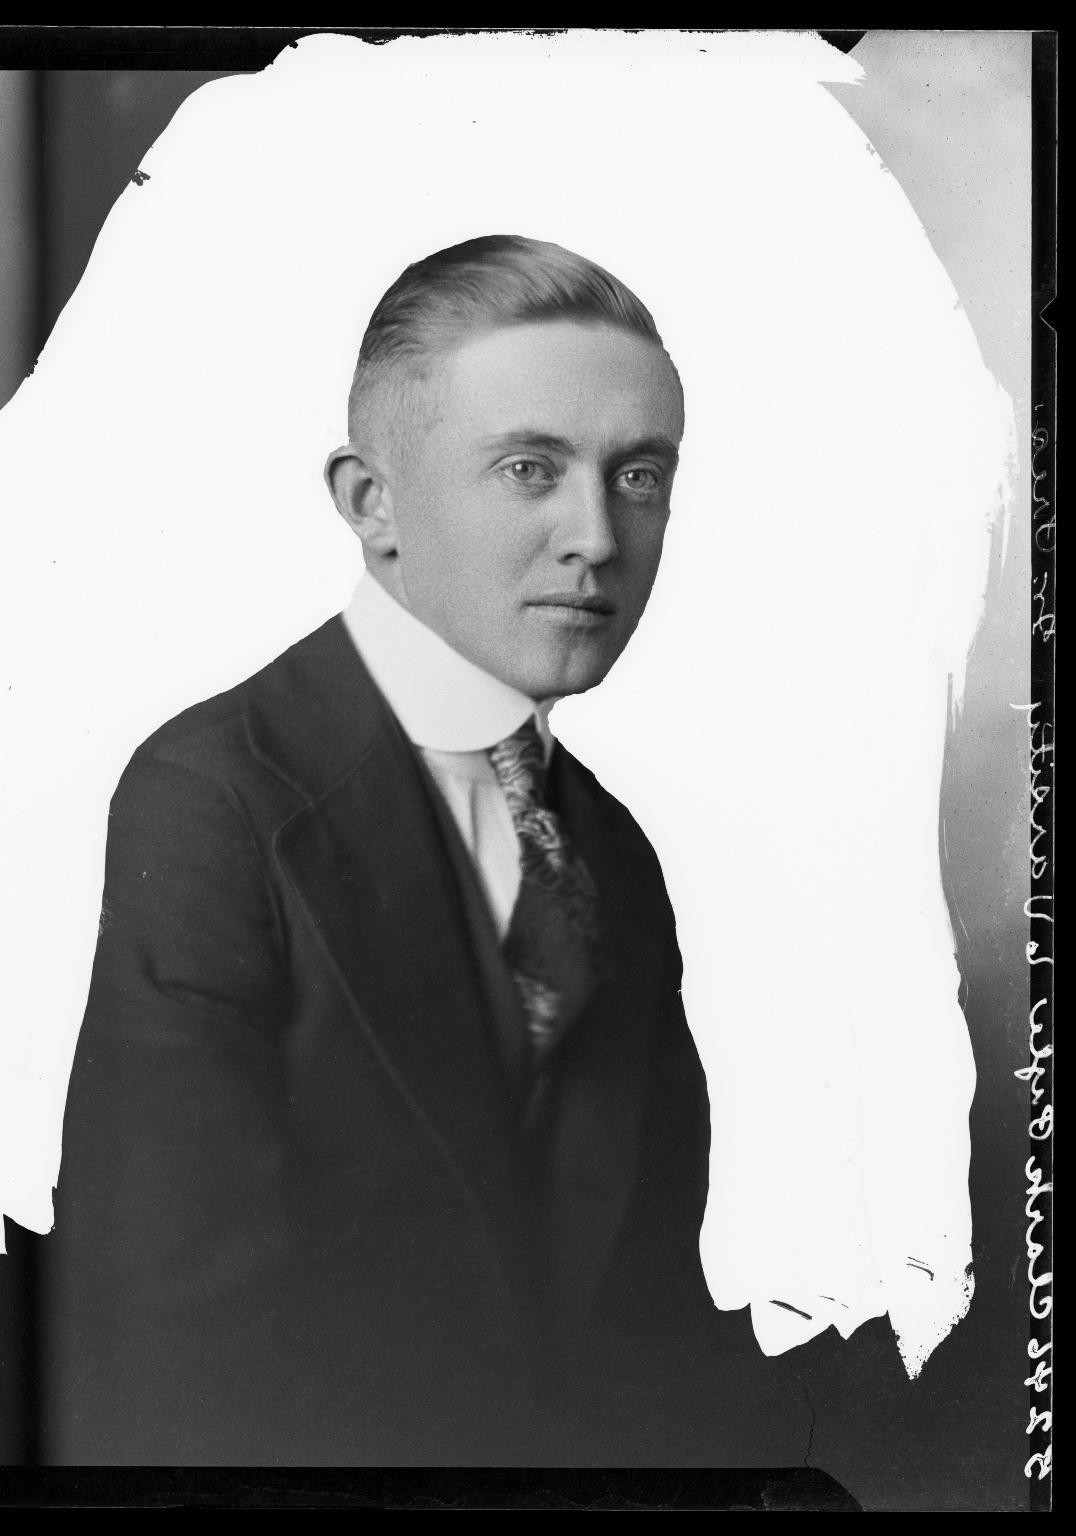 Portraits of Clark Pyle